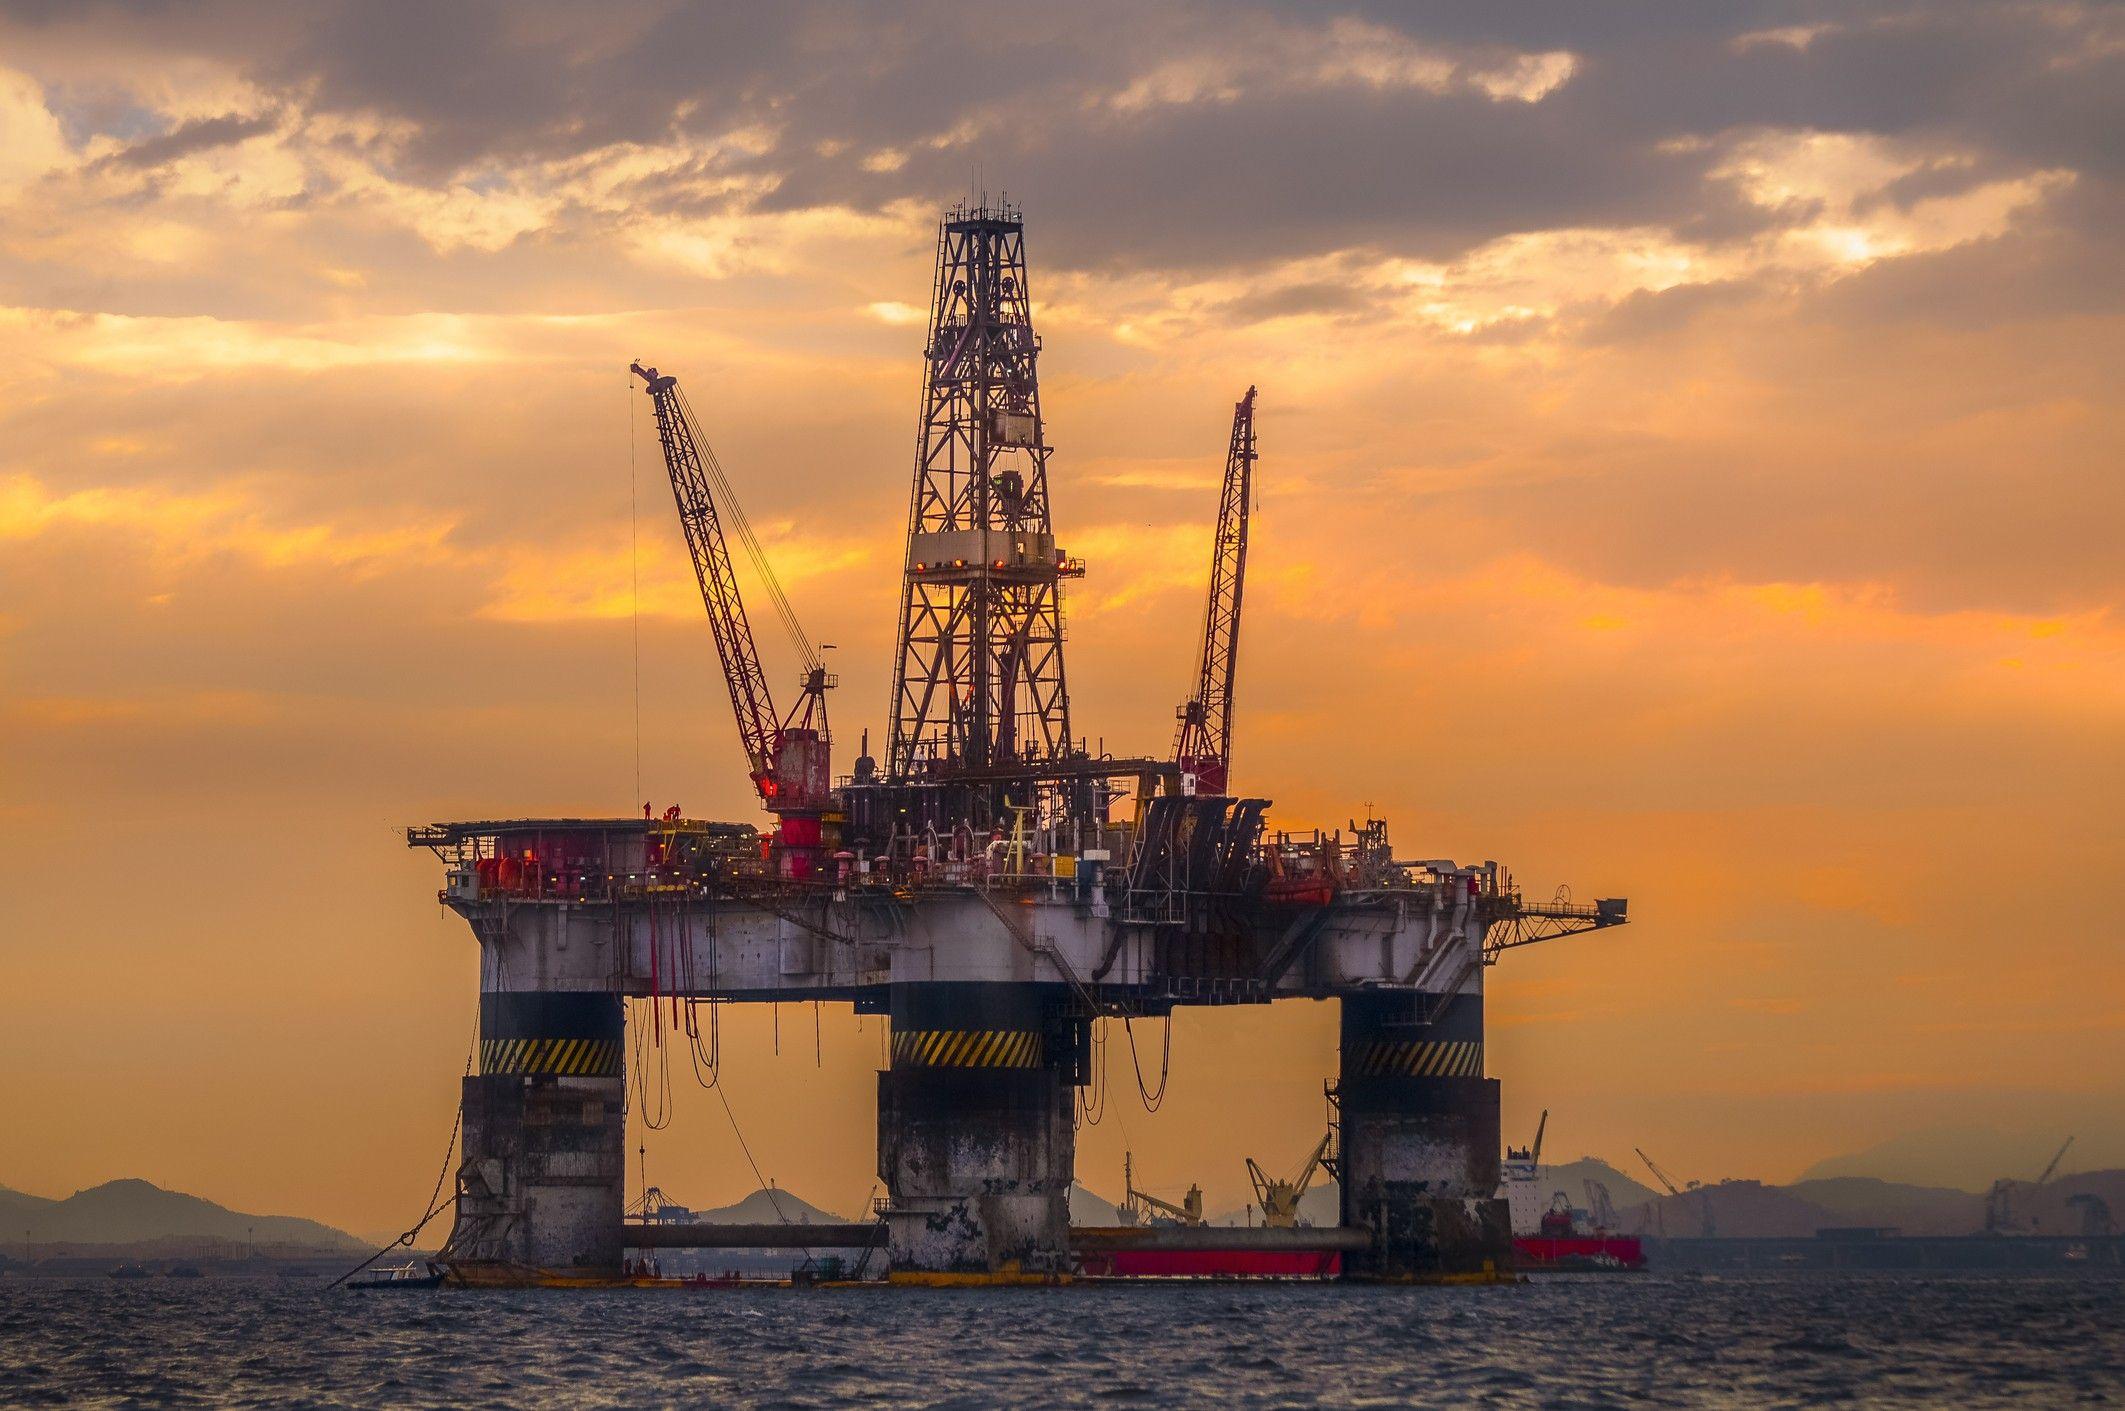 Ministério de Minas e Energia, programa, campos marítimos, energia